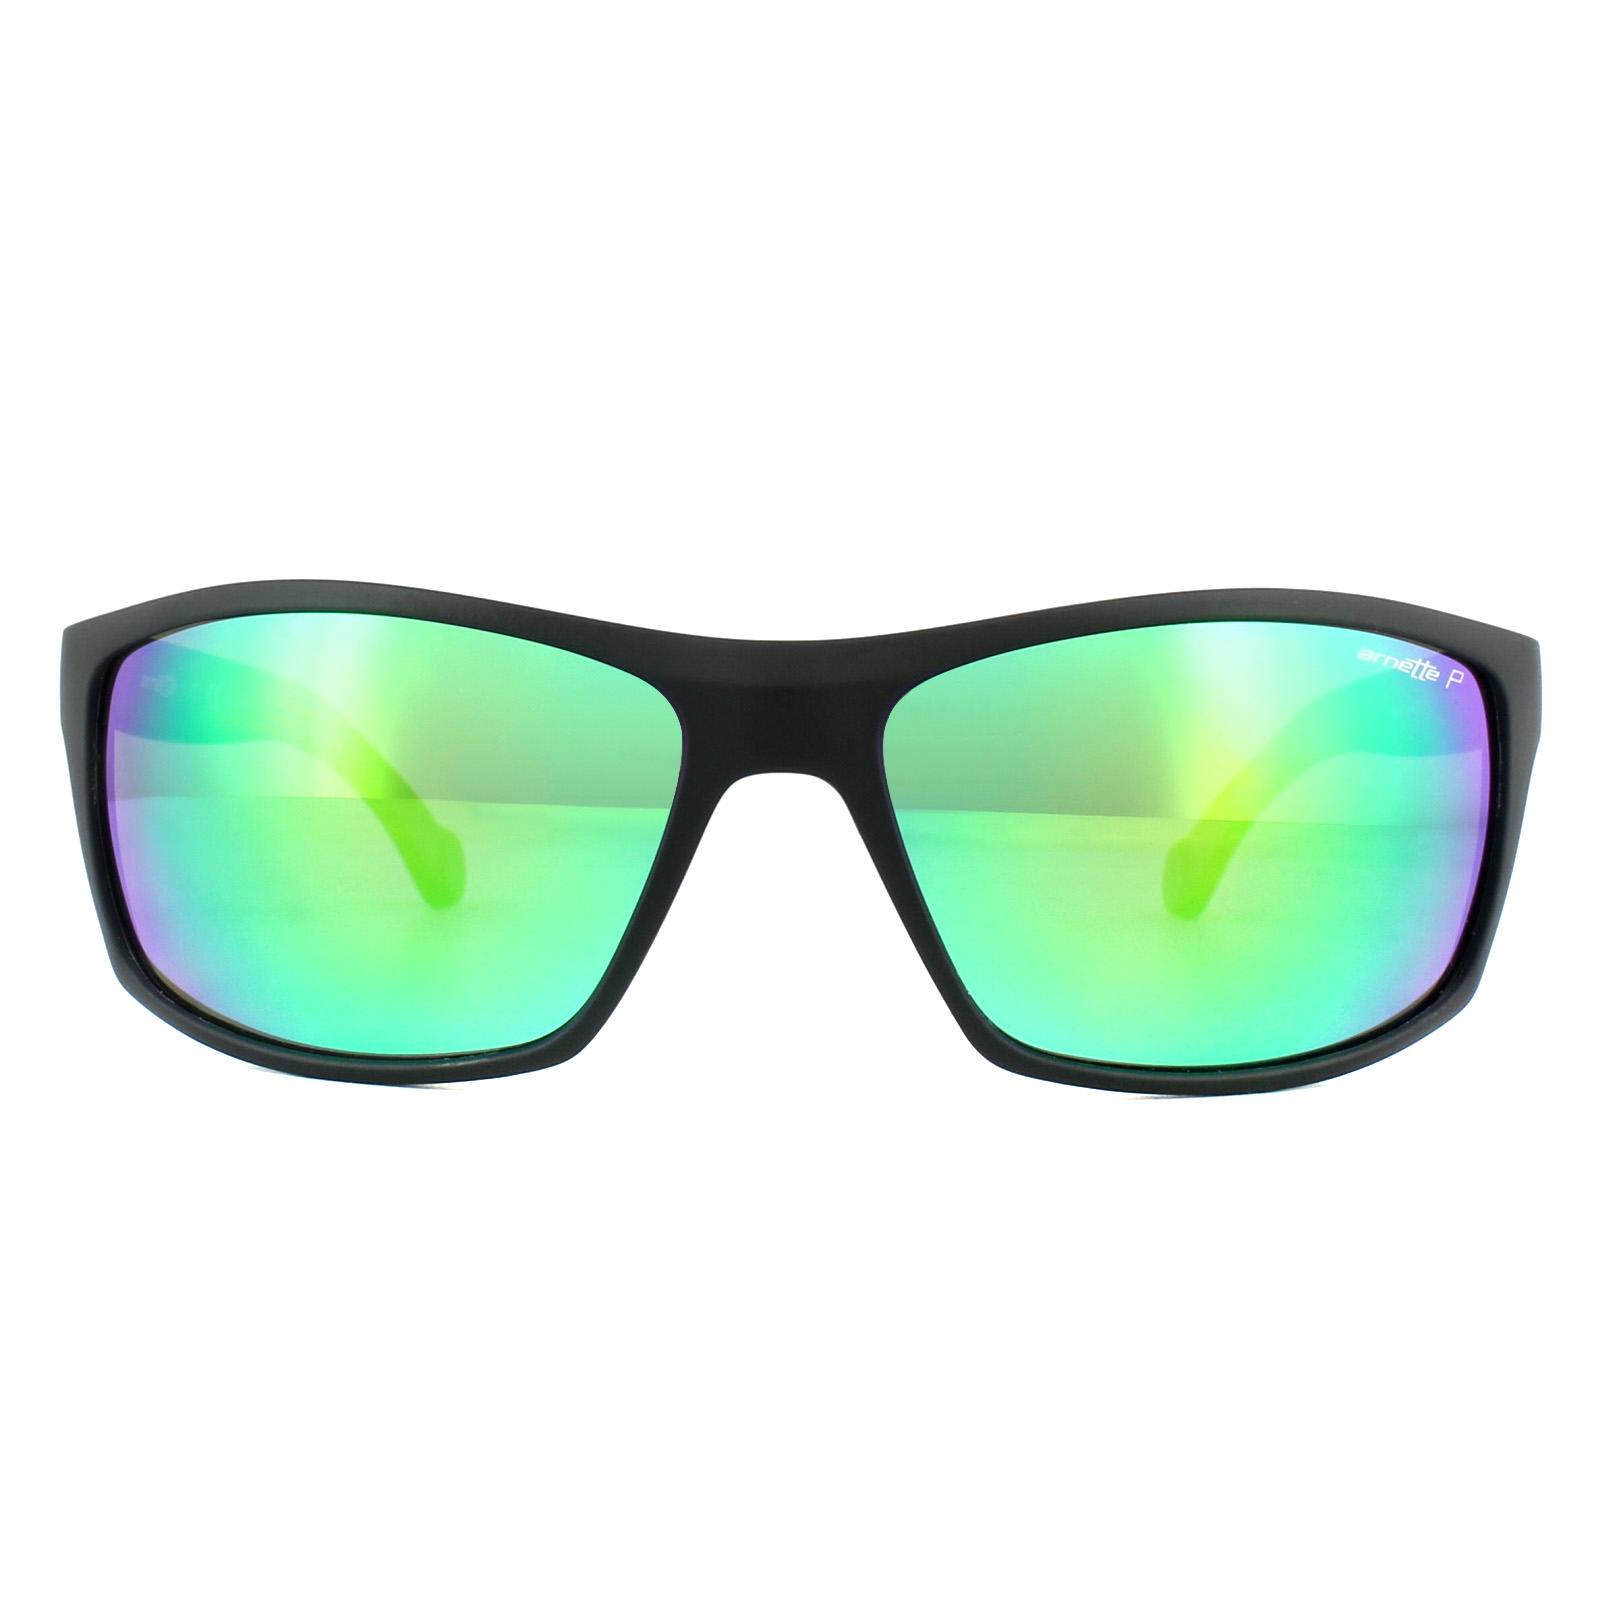 04a4970416 Sentinel Arnette Sunglasses 4207 Boiler 01 1L Matt Black Grey Mirror Green  Polarized